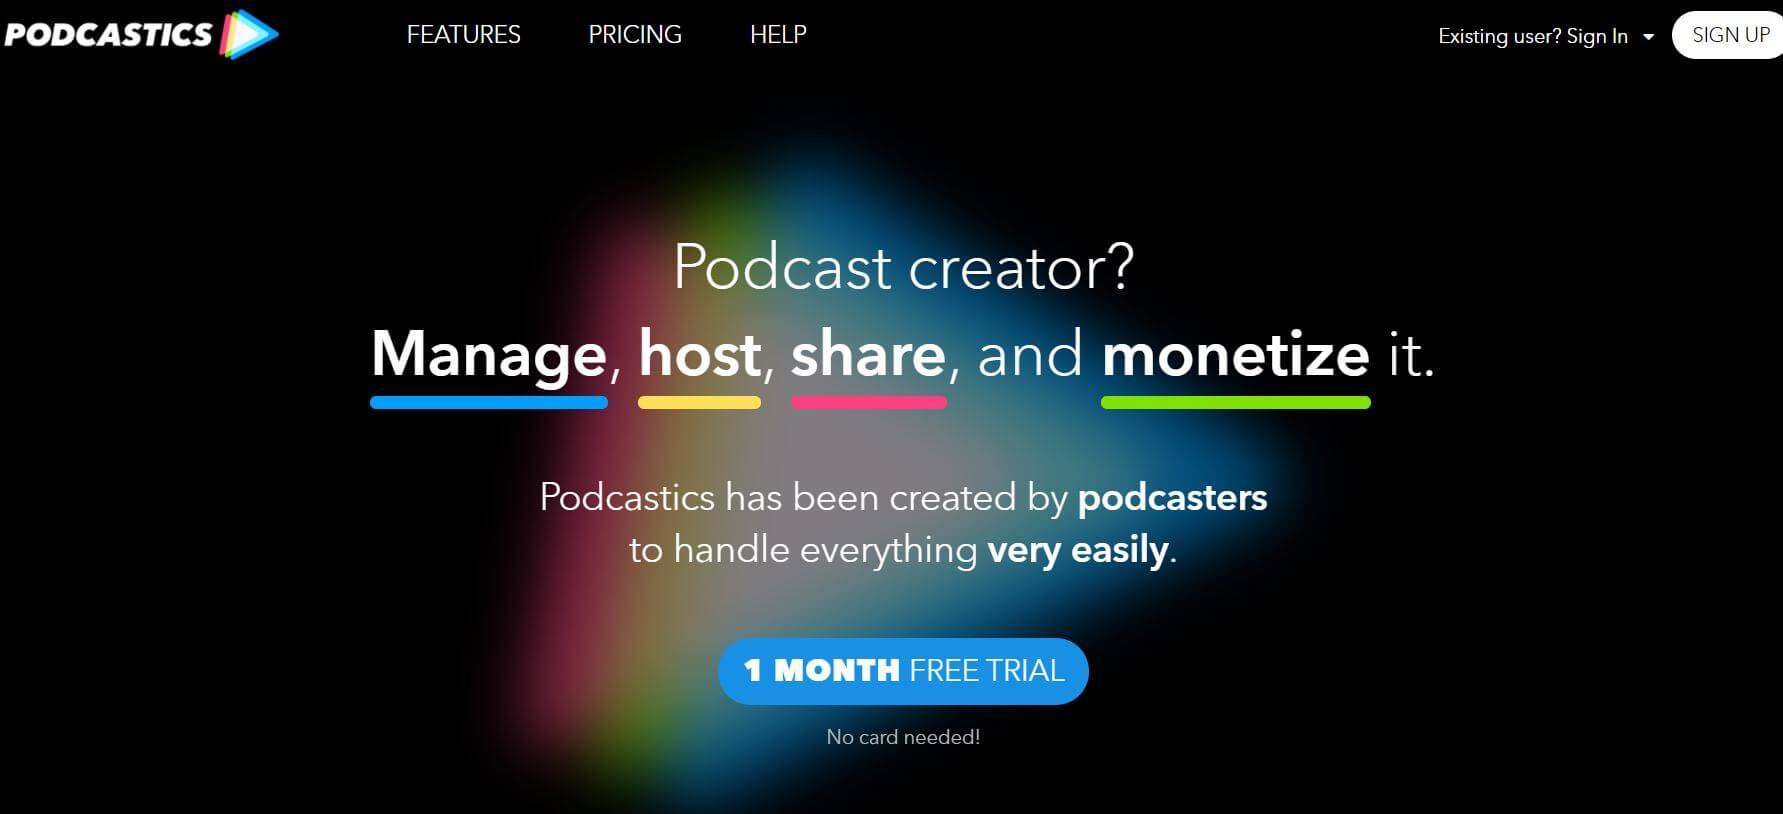 nen-tang-luu-tru-podcast-tot-nhat-podcastics